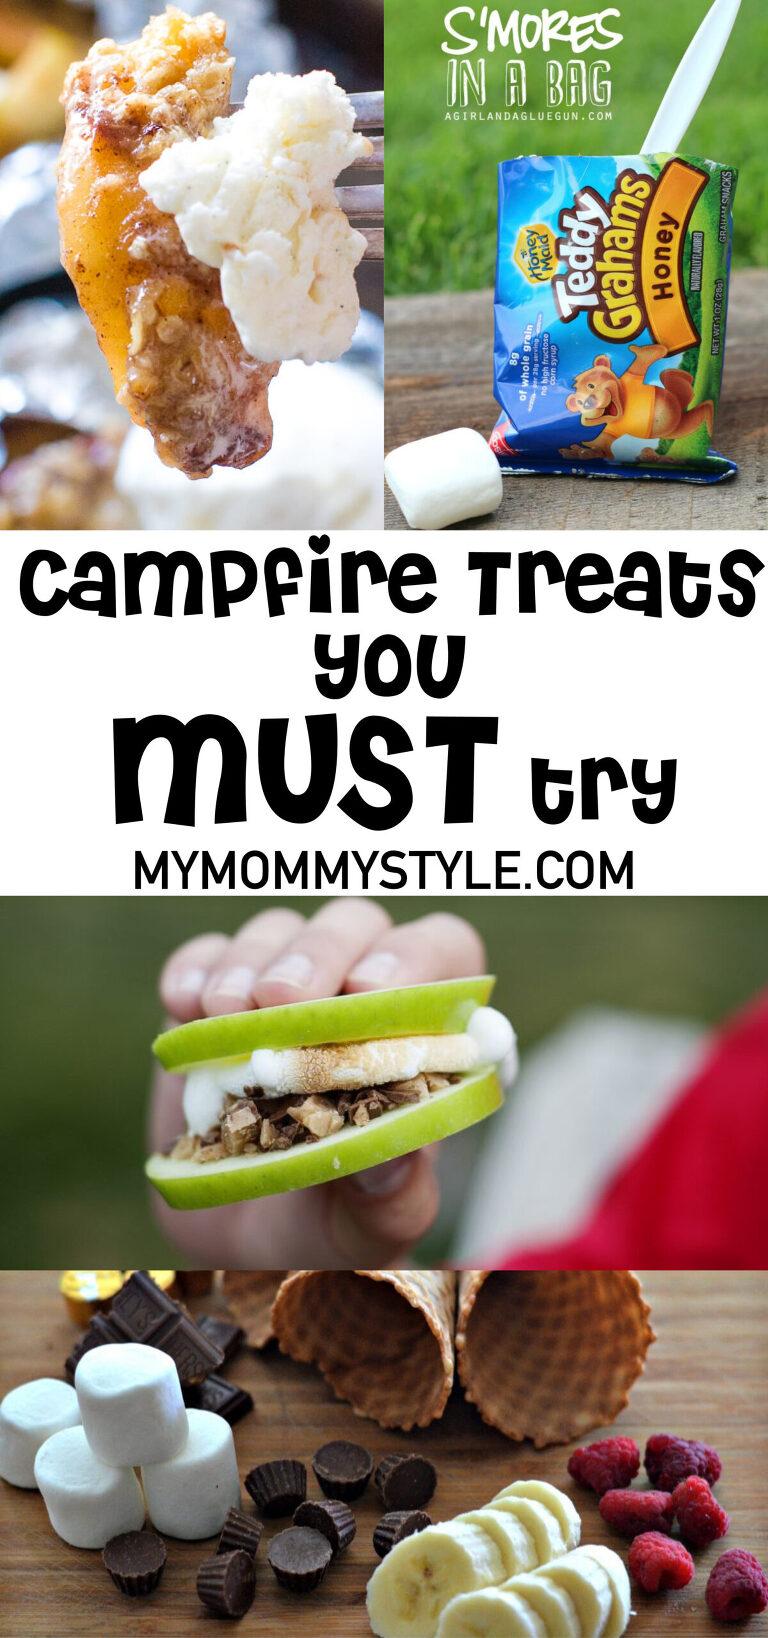 Yummy Campfire Treats to make while camping